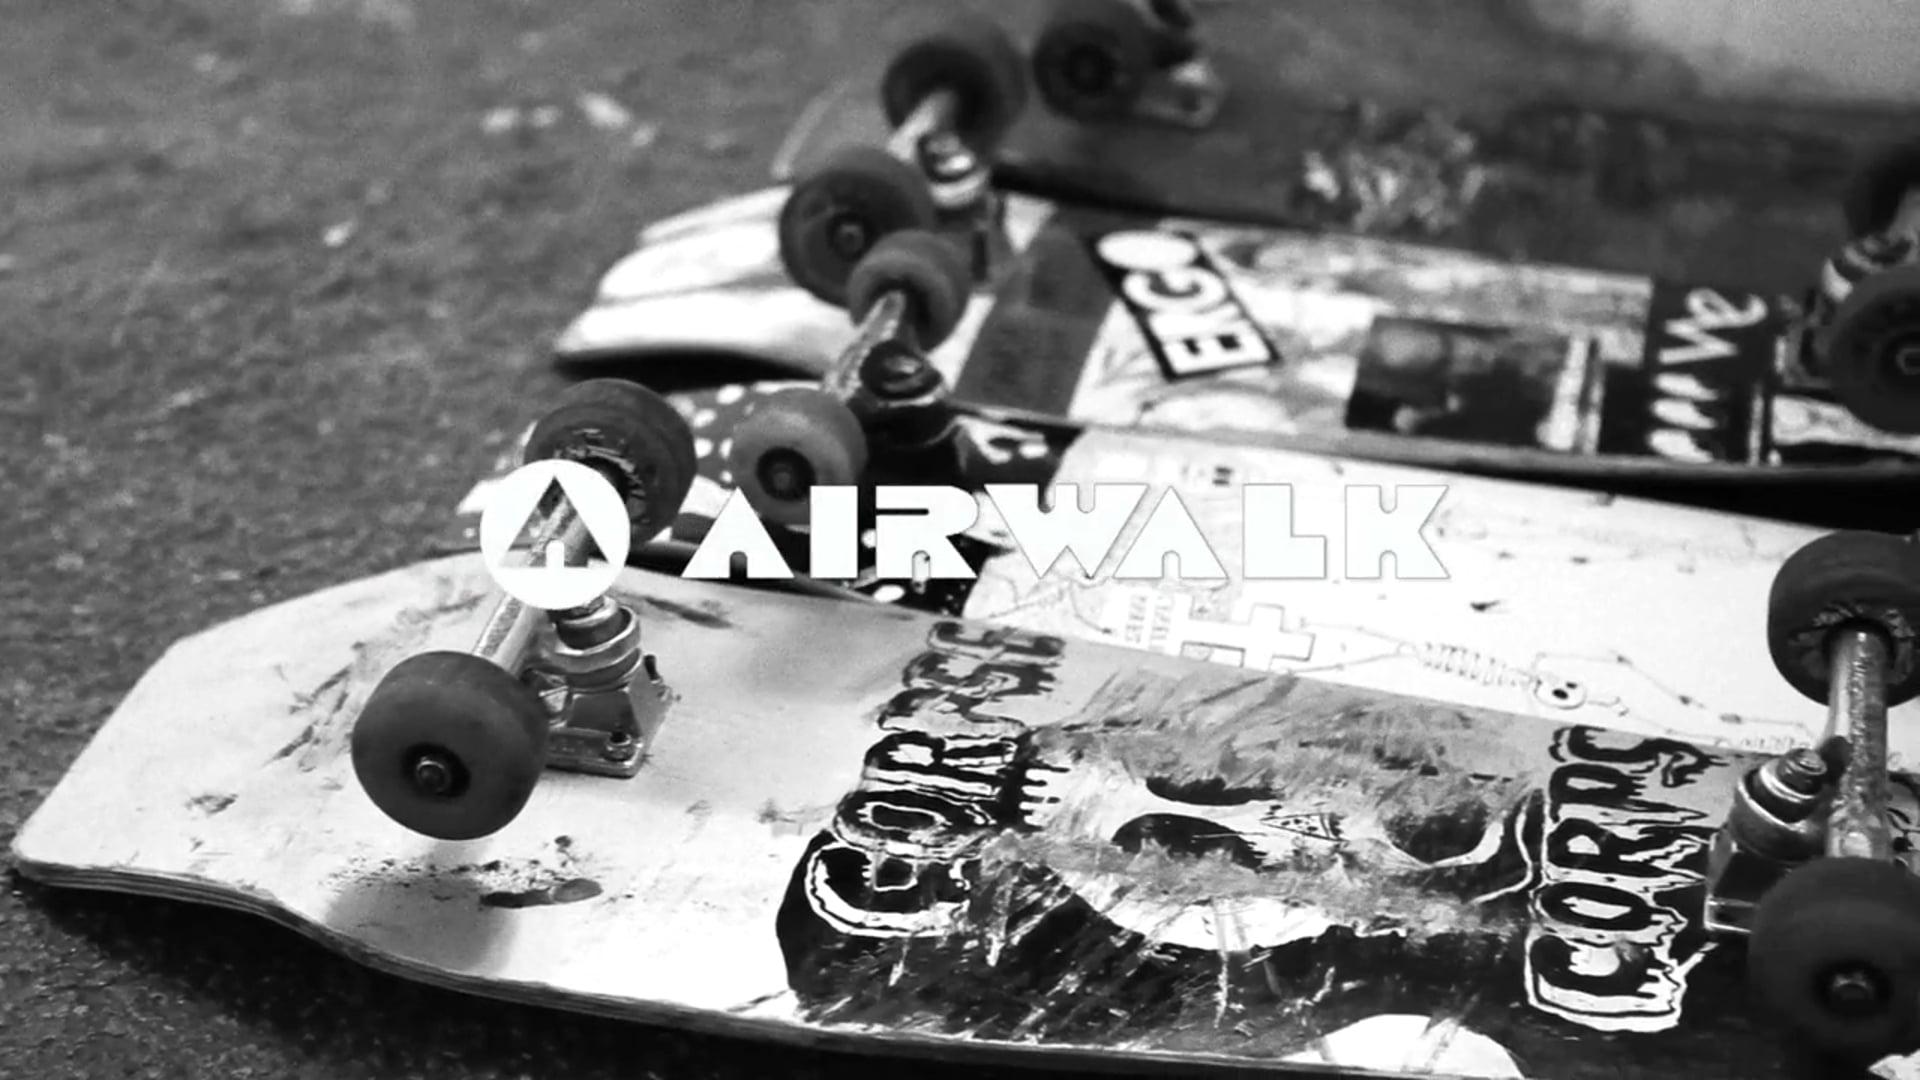 BTS - Airwalk - Already Famous